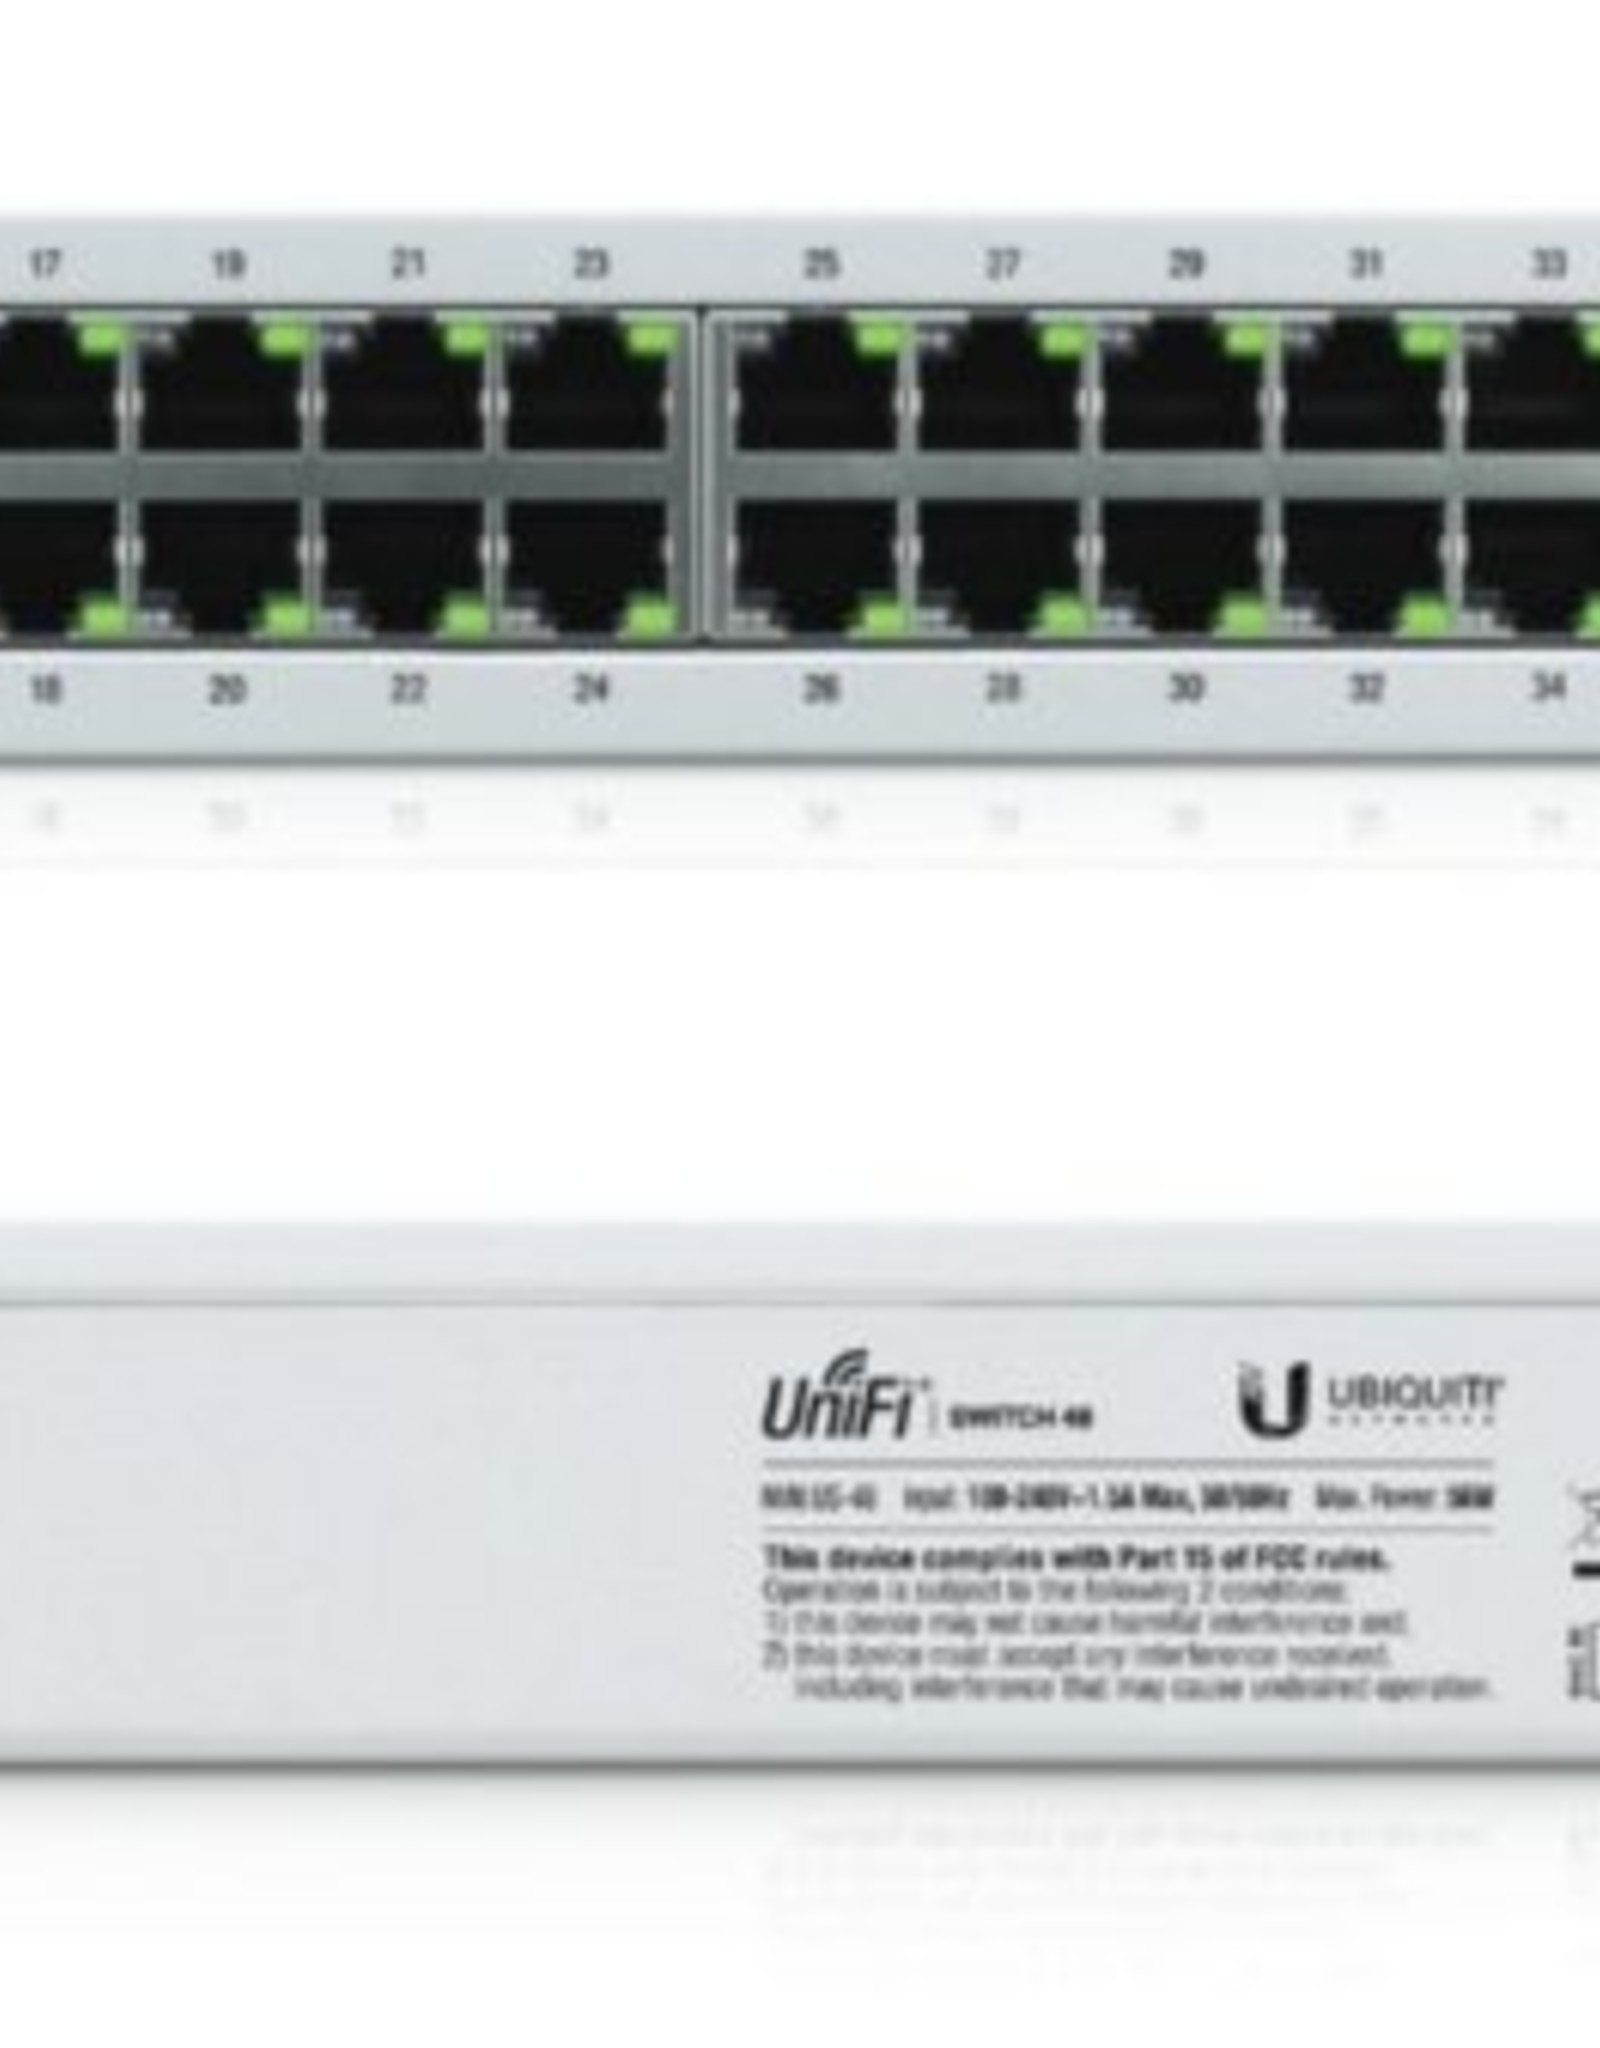 US-48 Managed network switch Gigabit Network Switch